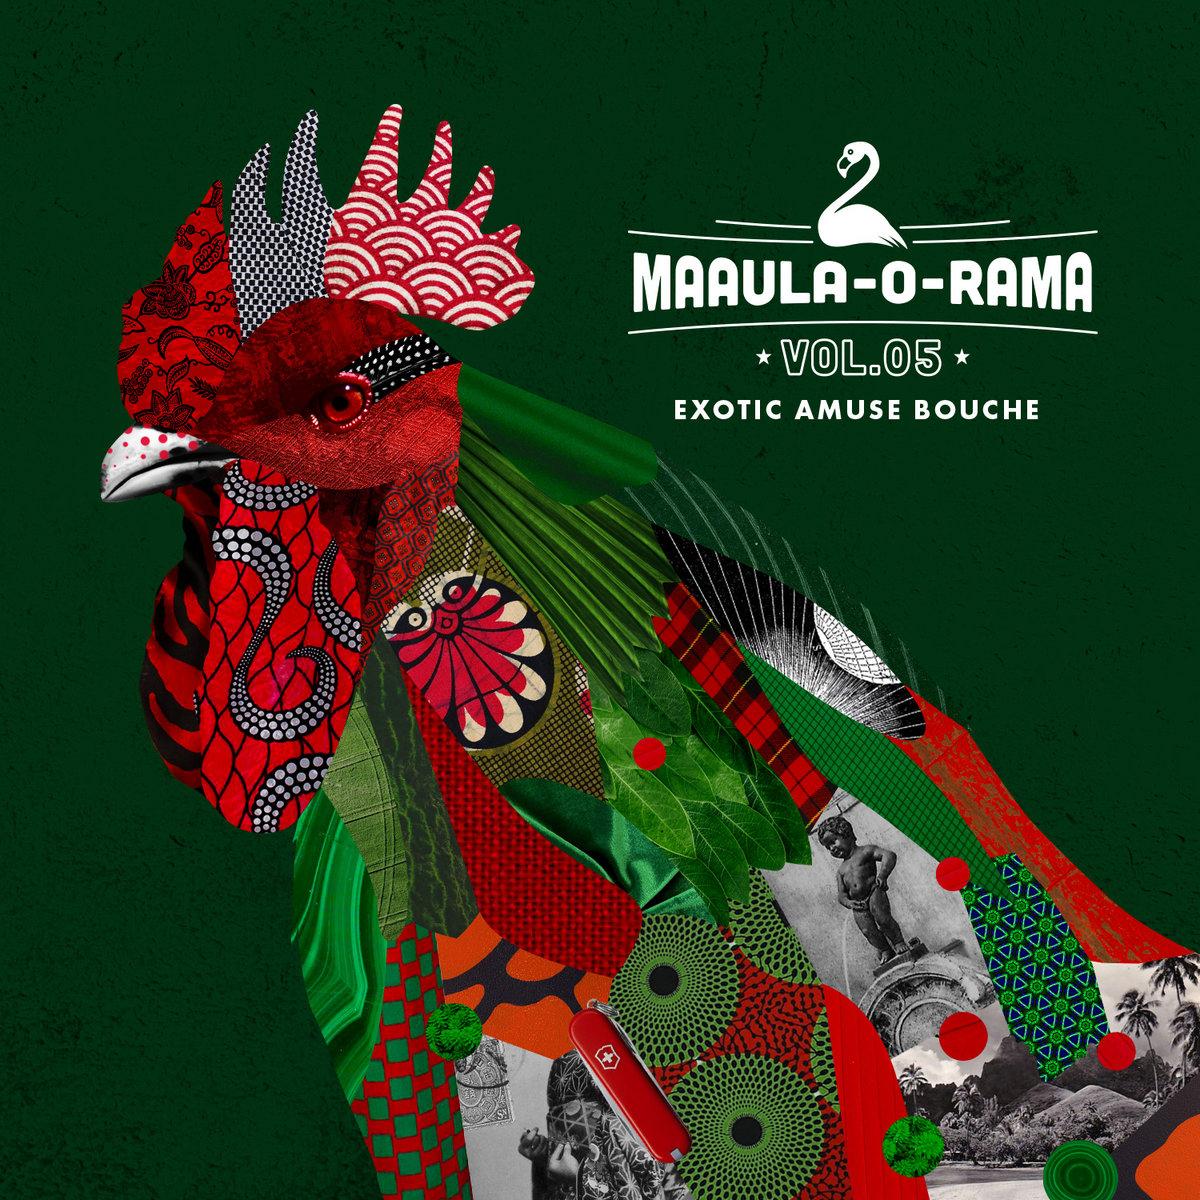 MaAuLa Records – MaAuLa-o-rama Vol.5 – Exotic Amuse Bouche